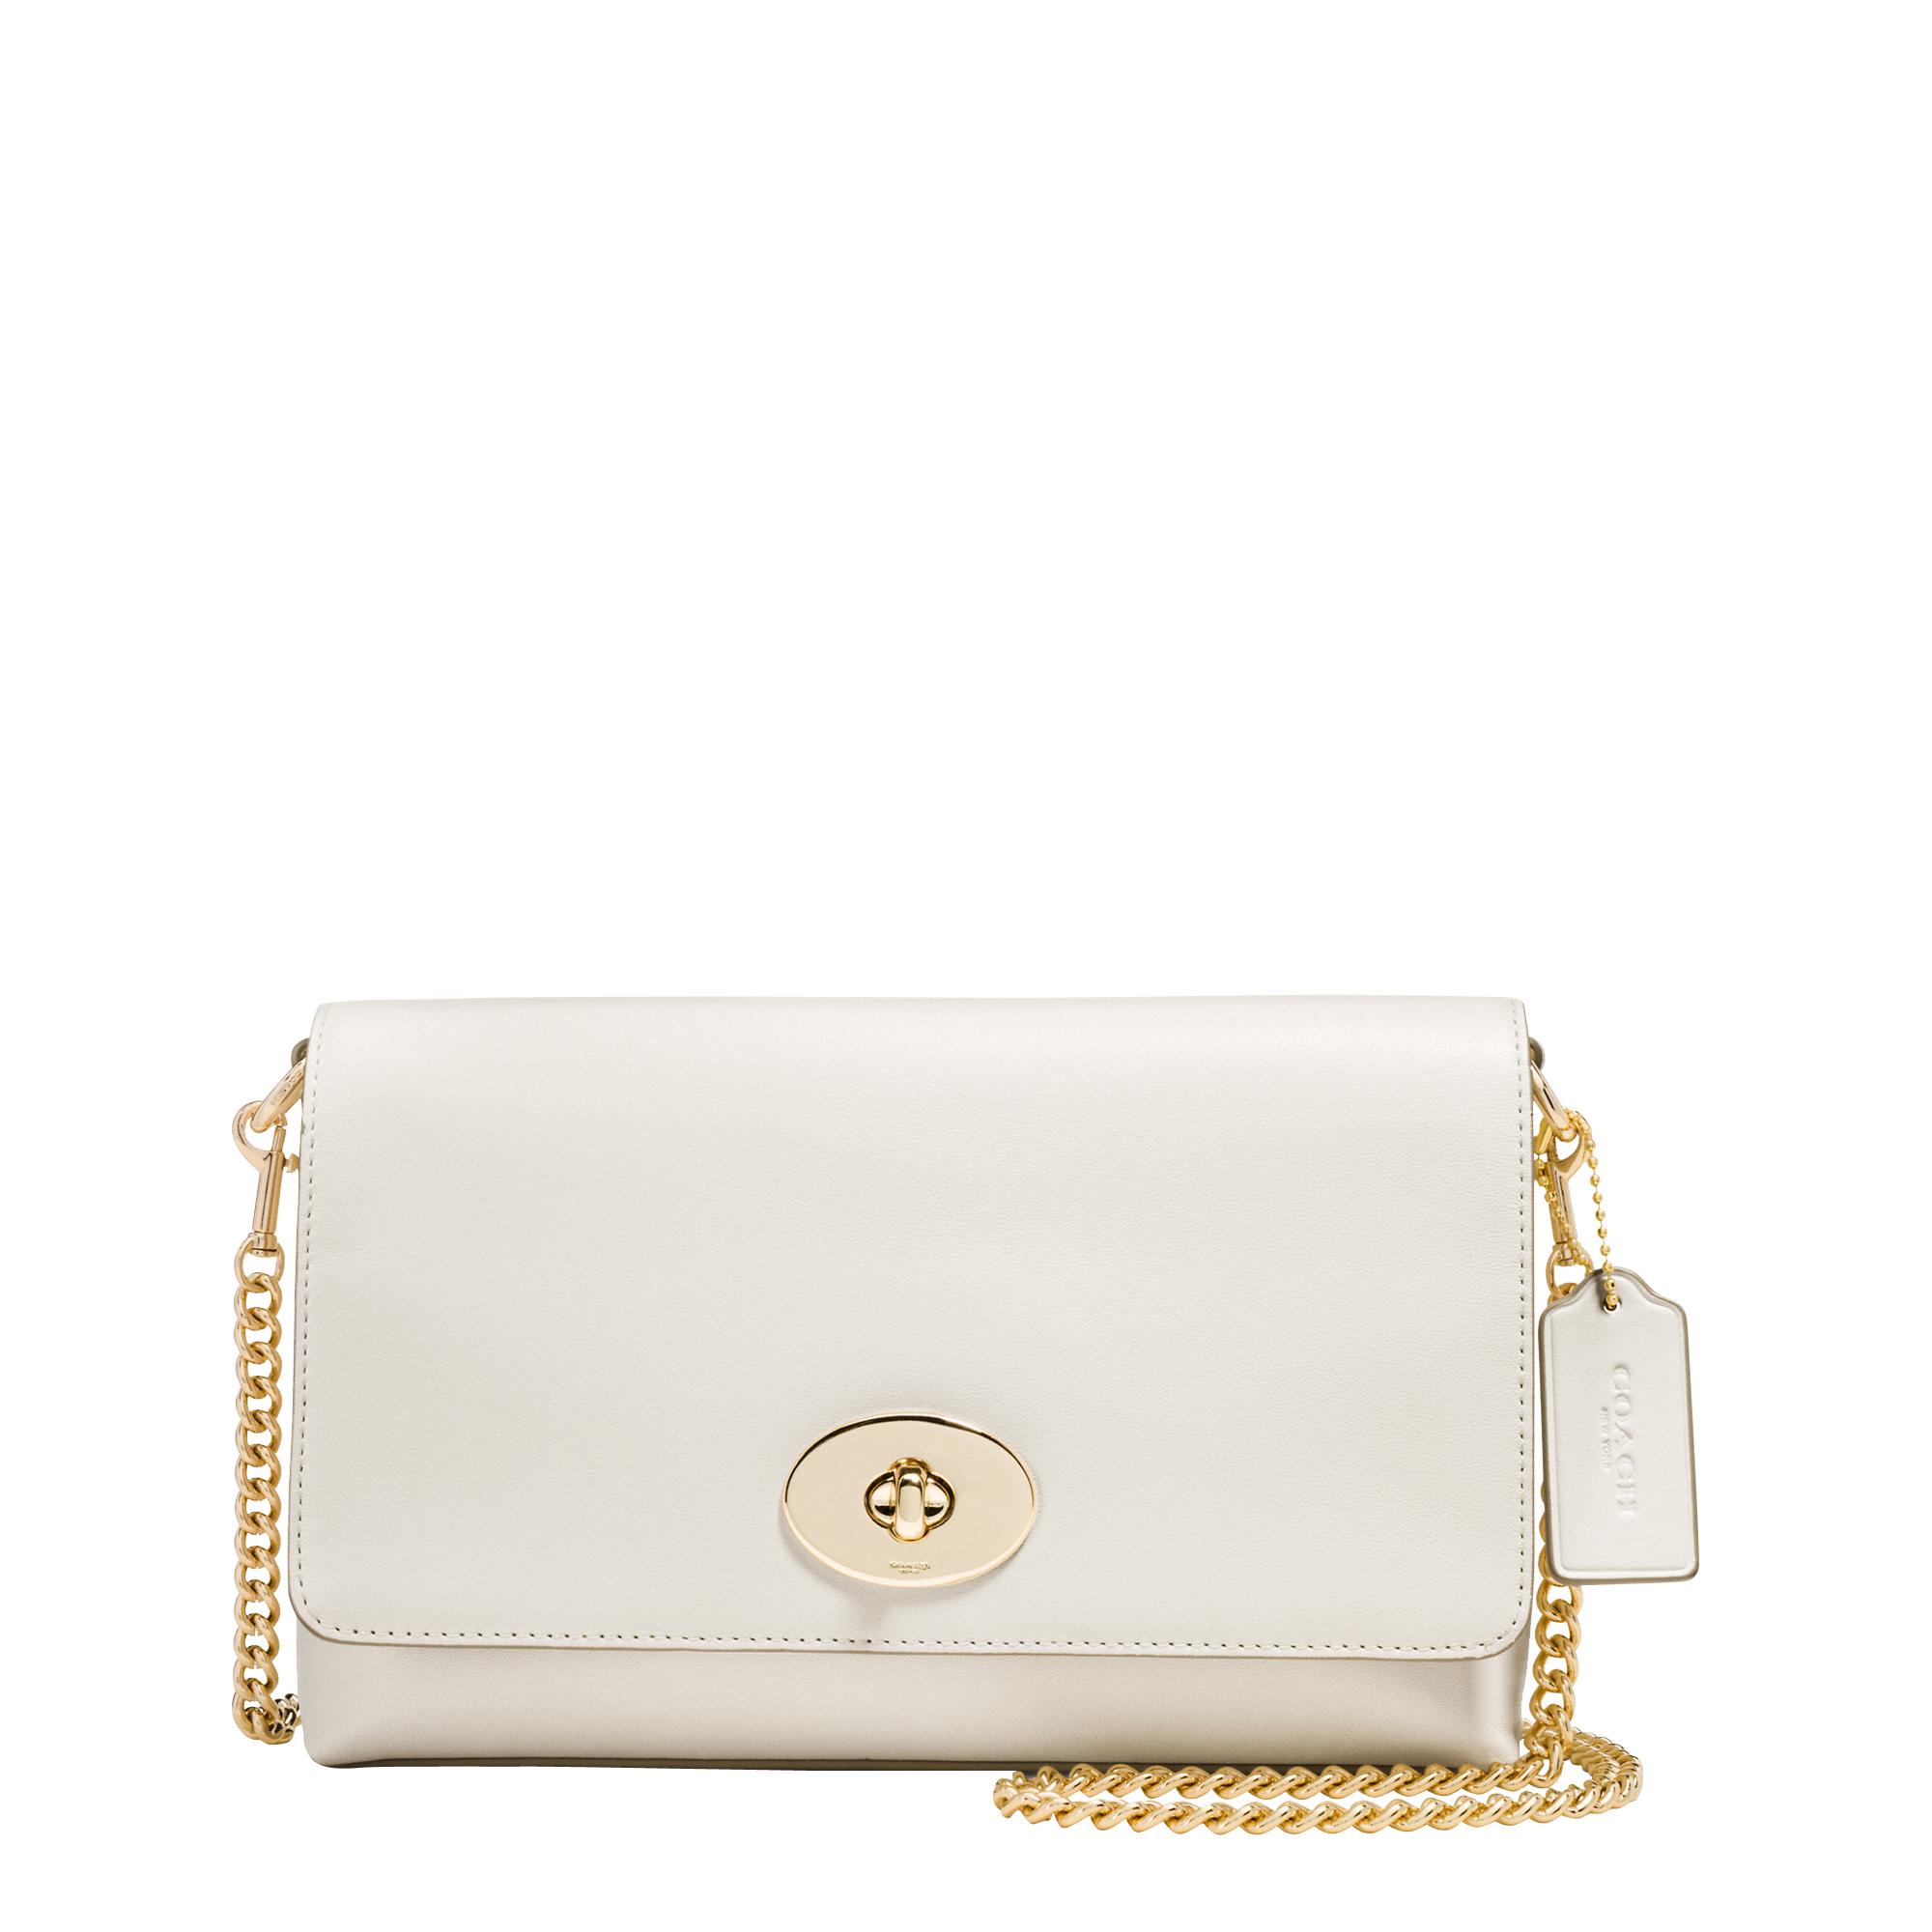 5c9e4ed717 inexpensive coach shoulder bag 62351 70f83; best price lyst coach crosstown  crossbody clutch in white c2f81 a5ee3